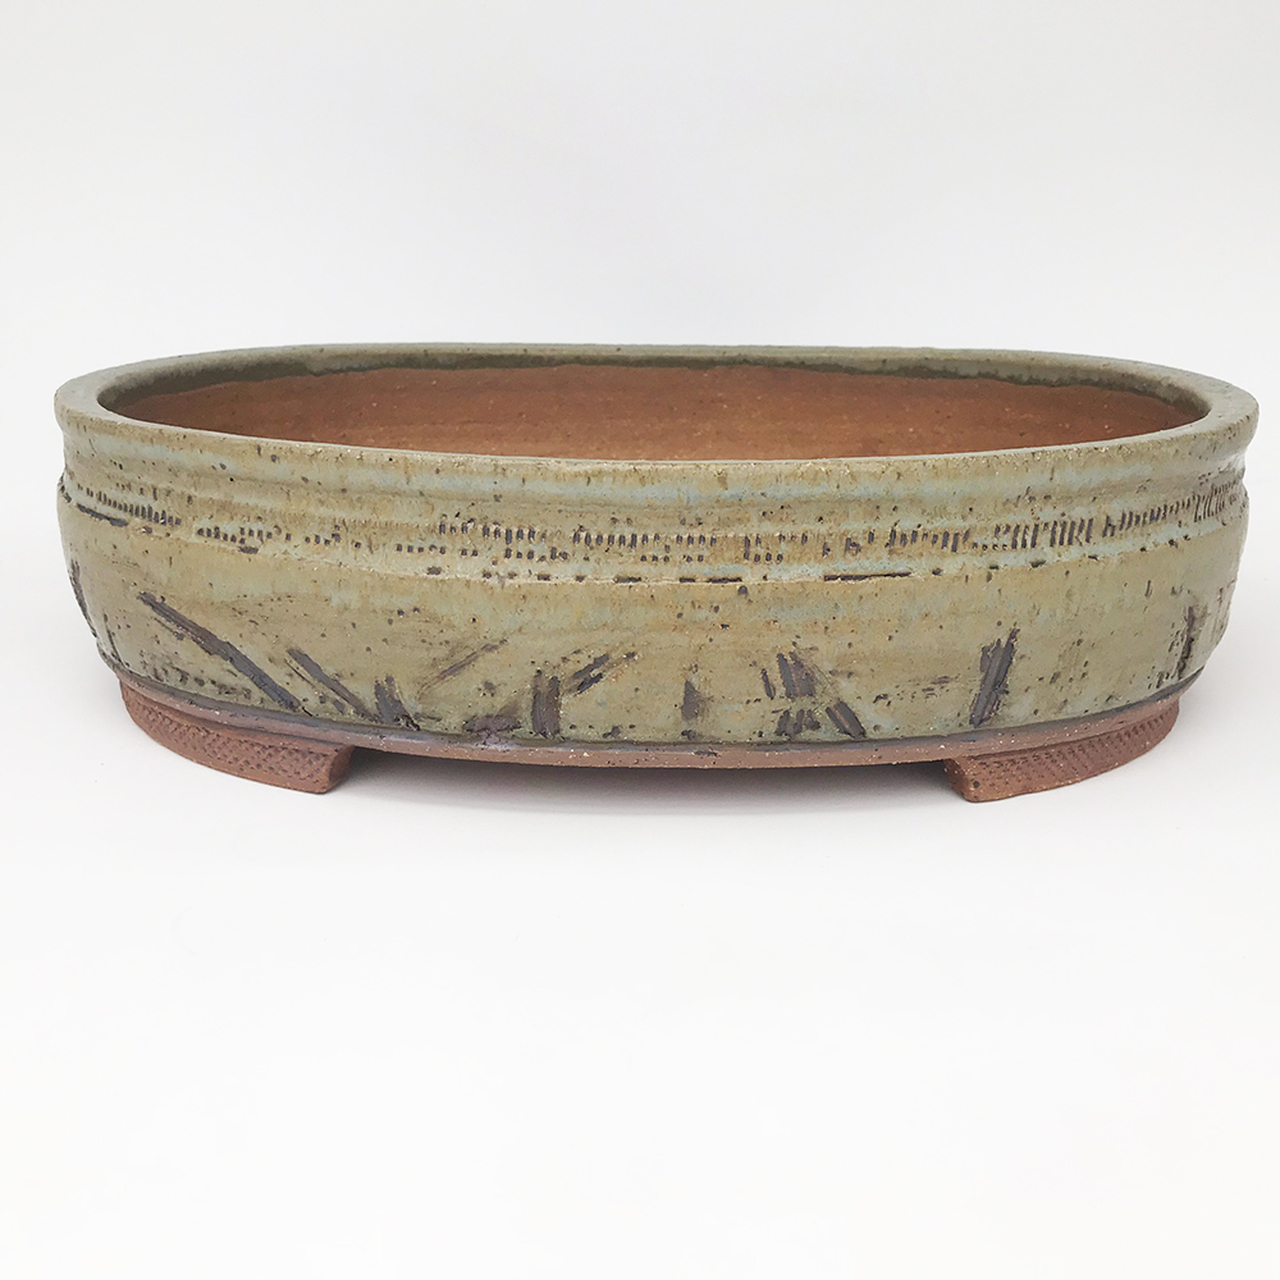 American Handmade Pots